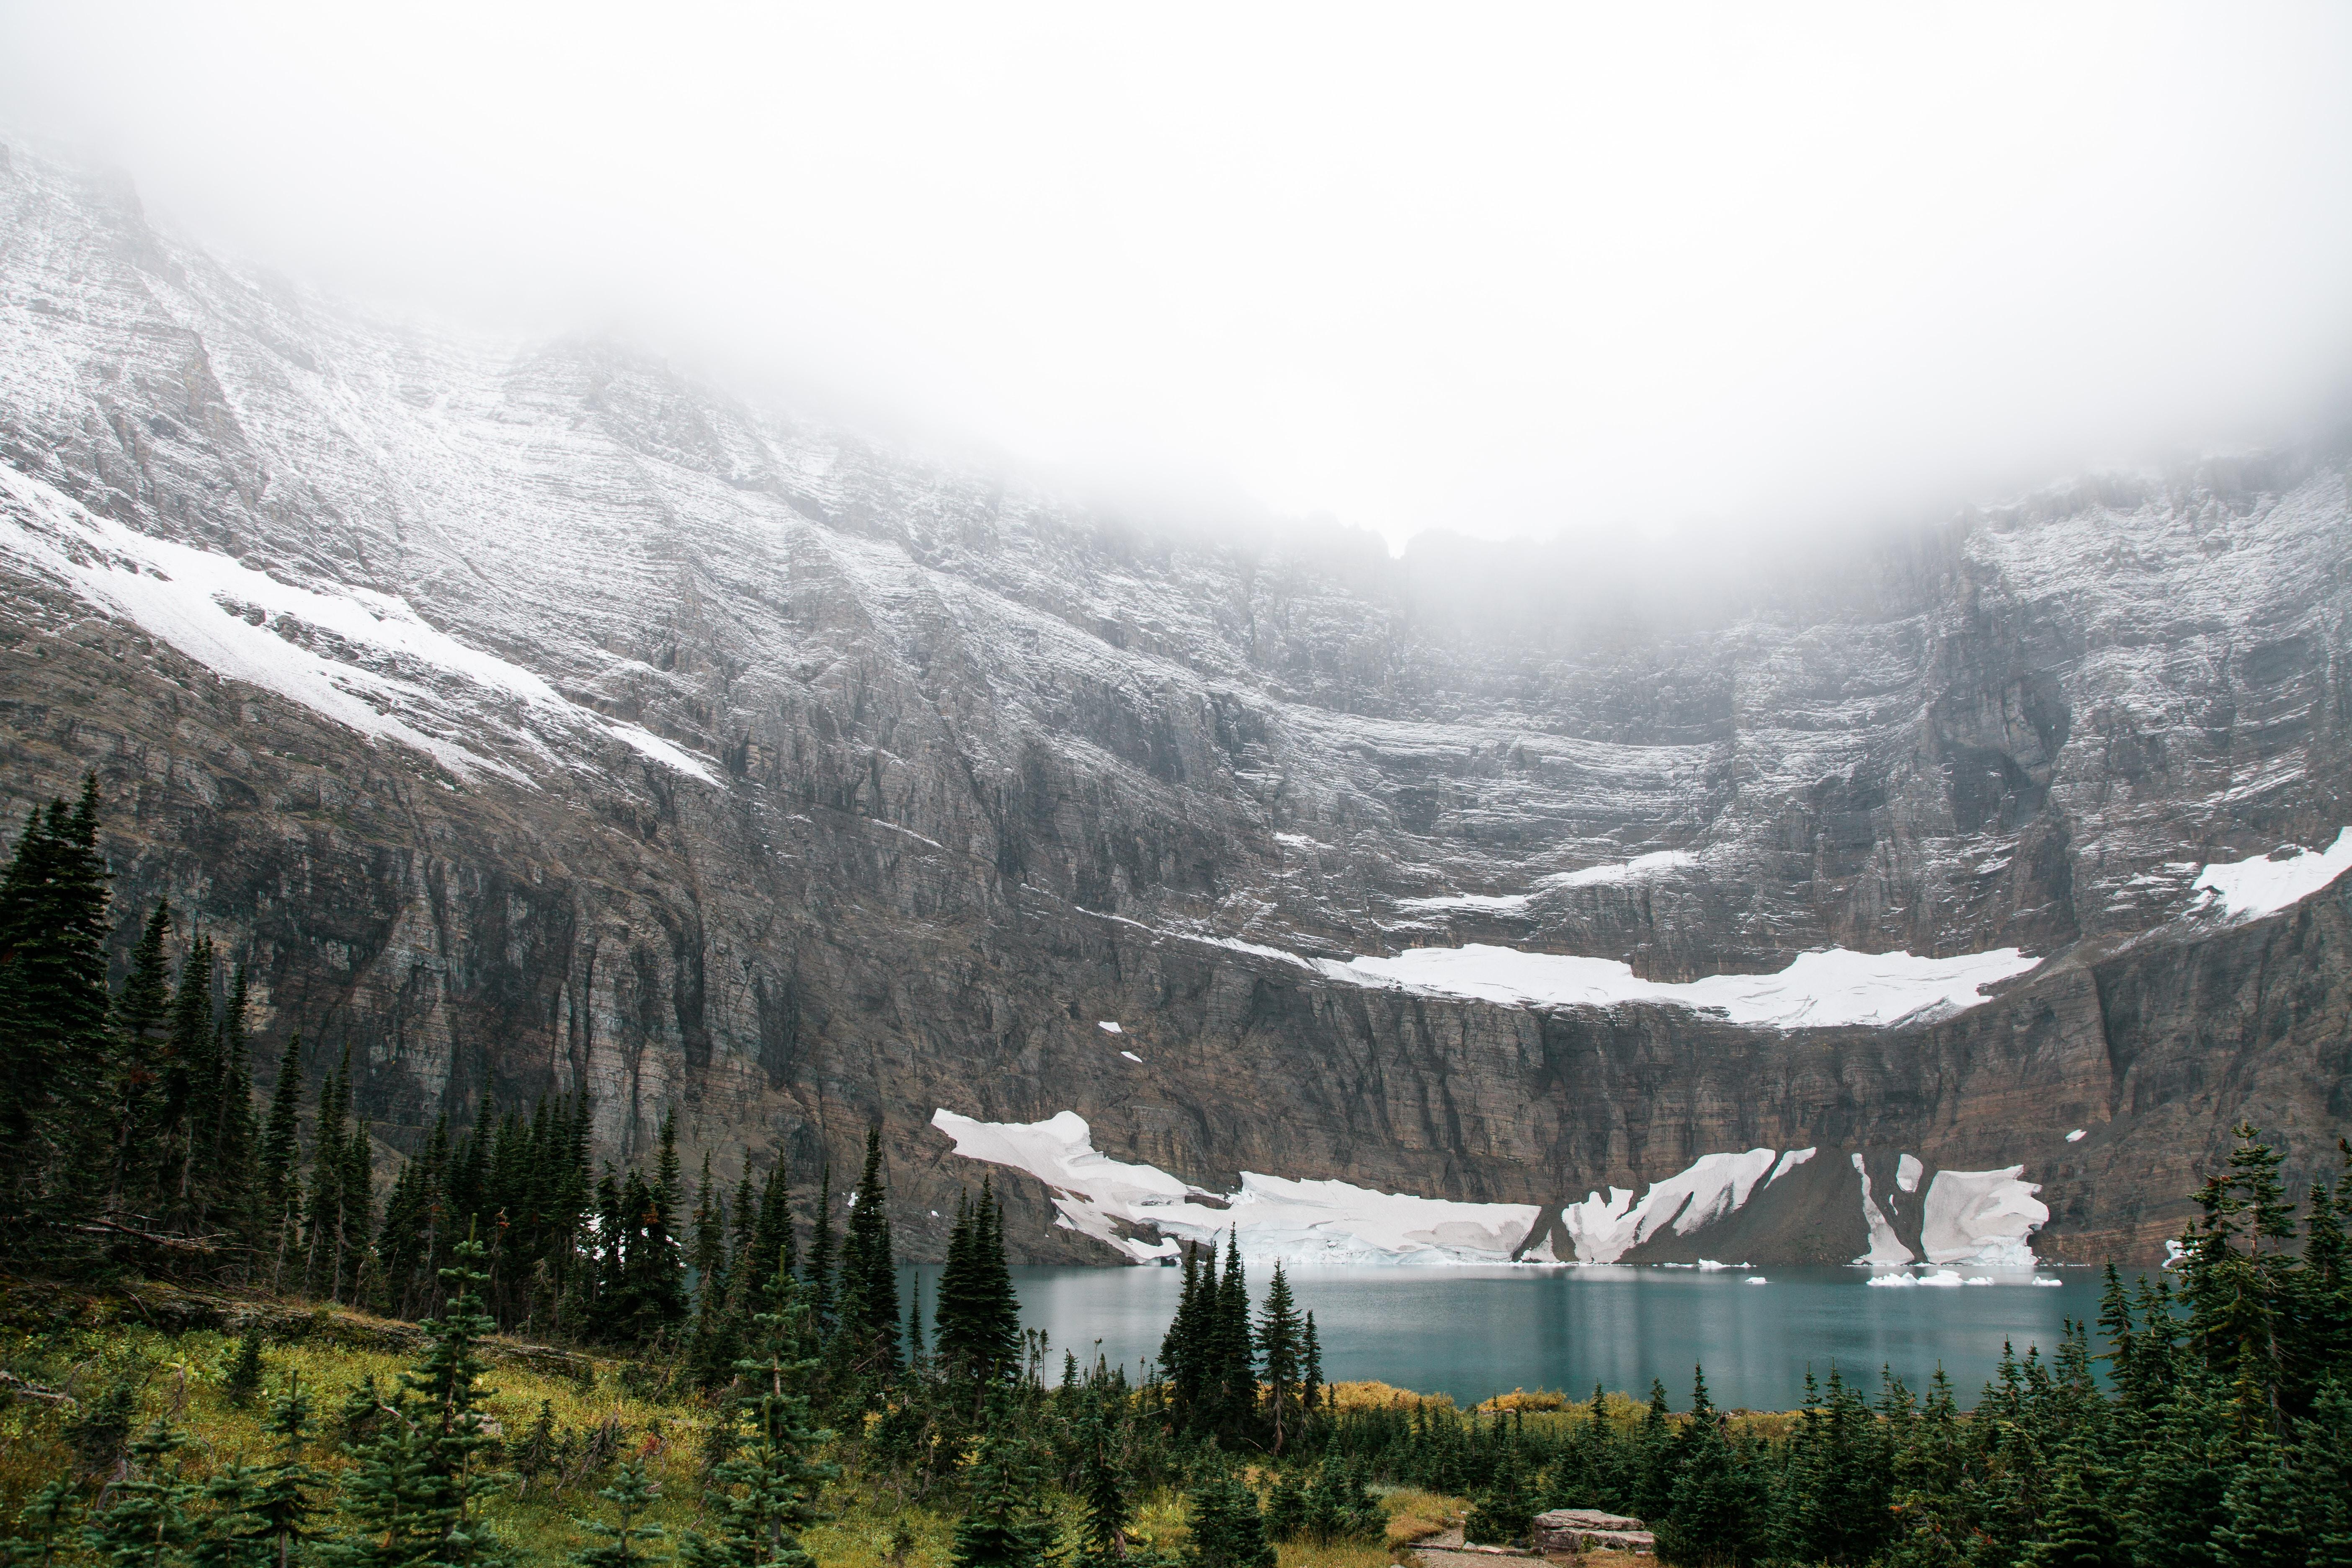 landscape photo of lake near mountain